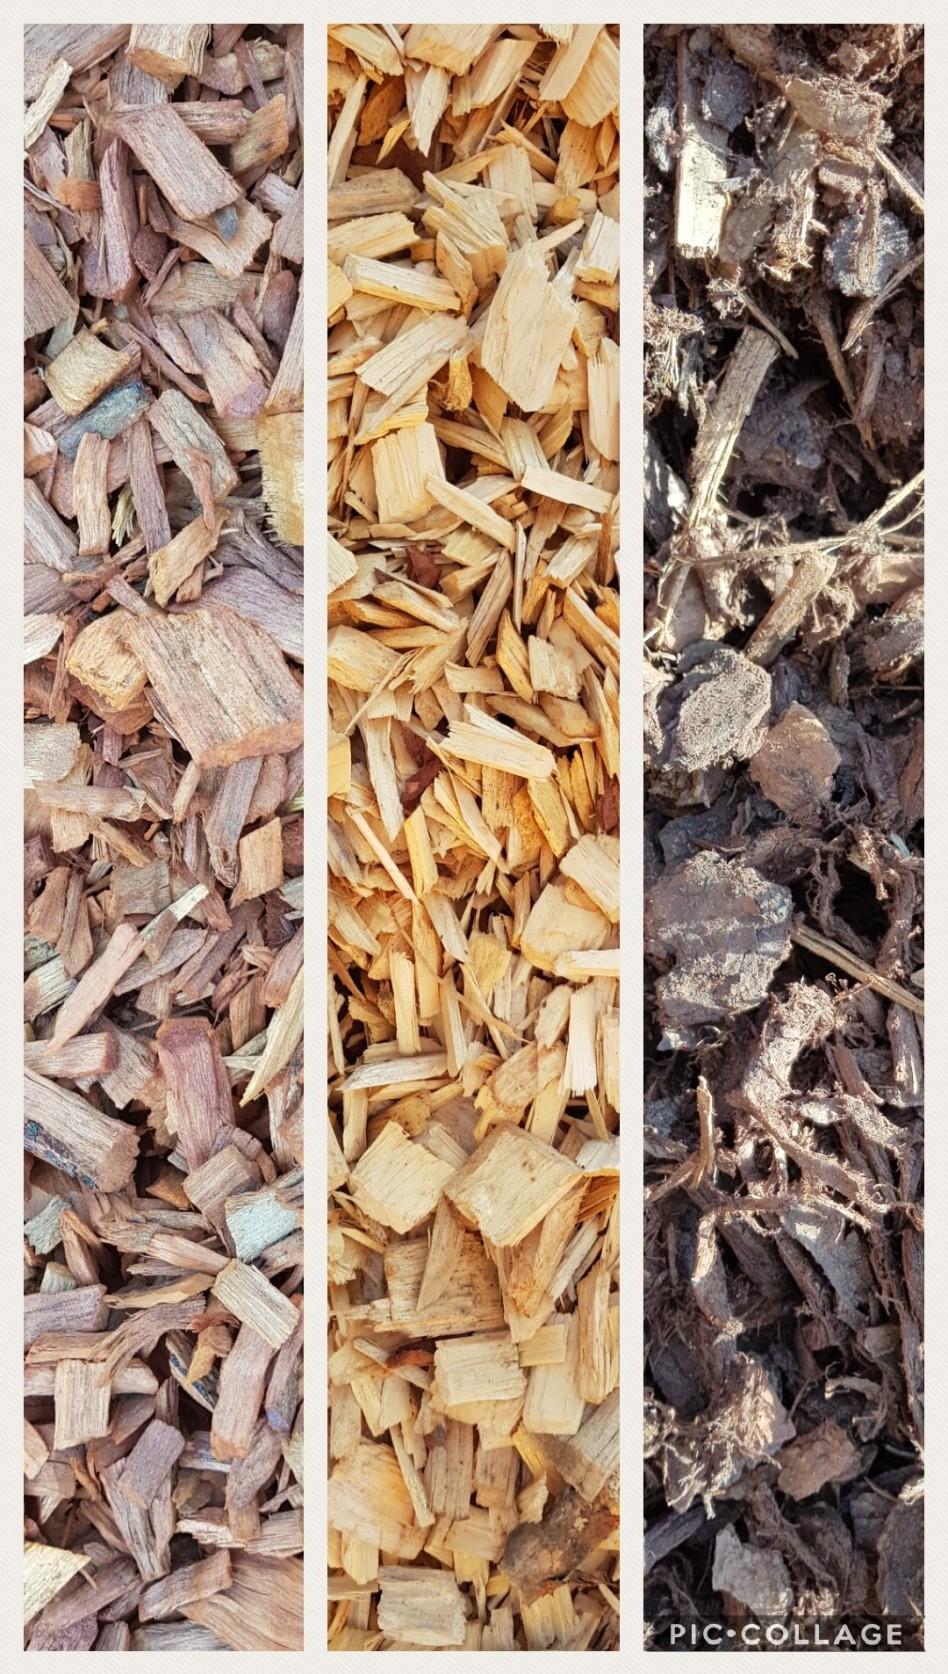 Redgum Chip, Playground Chip & Graded Bark